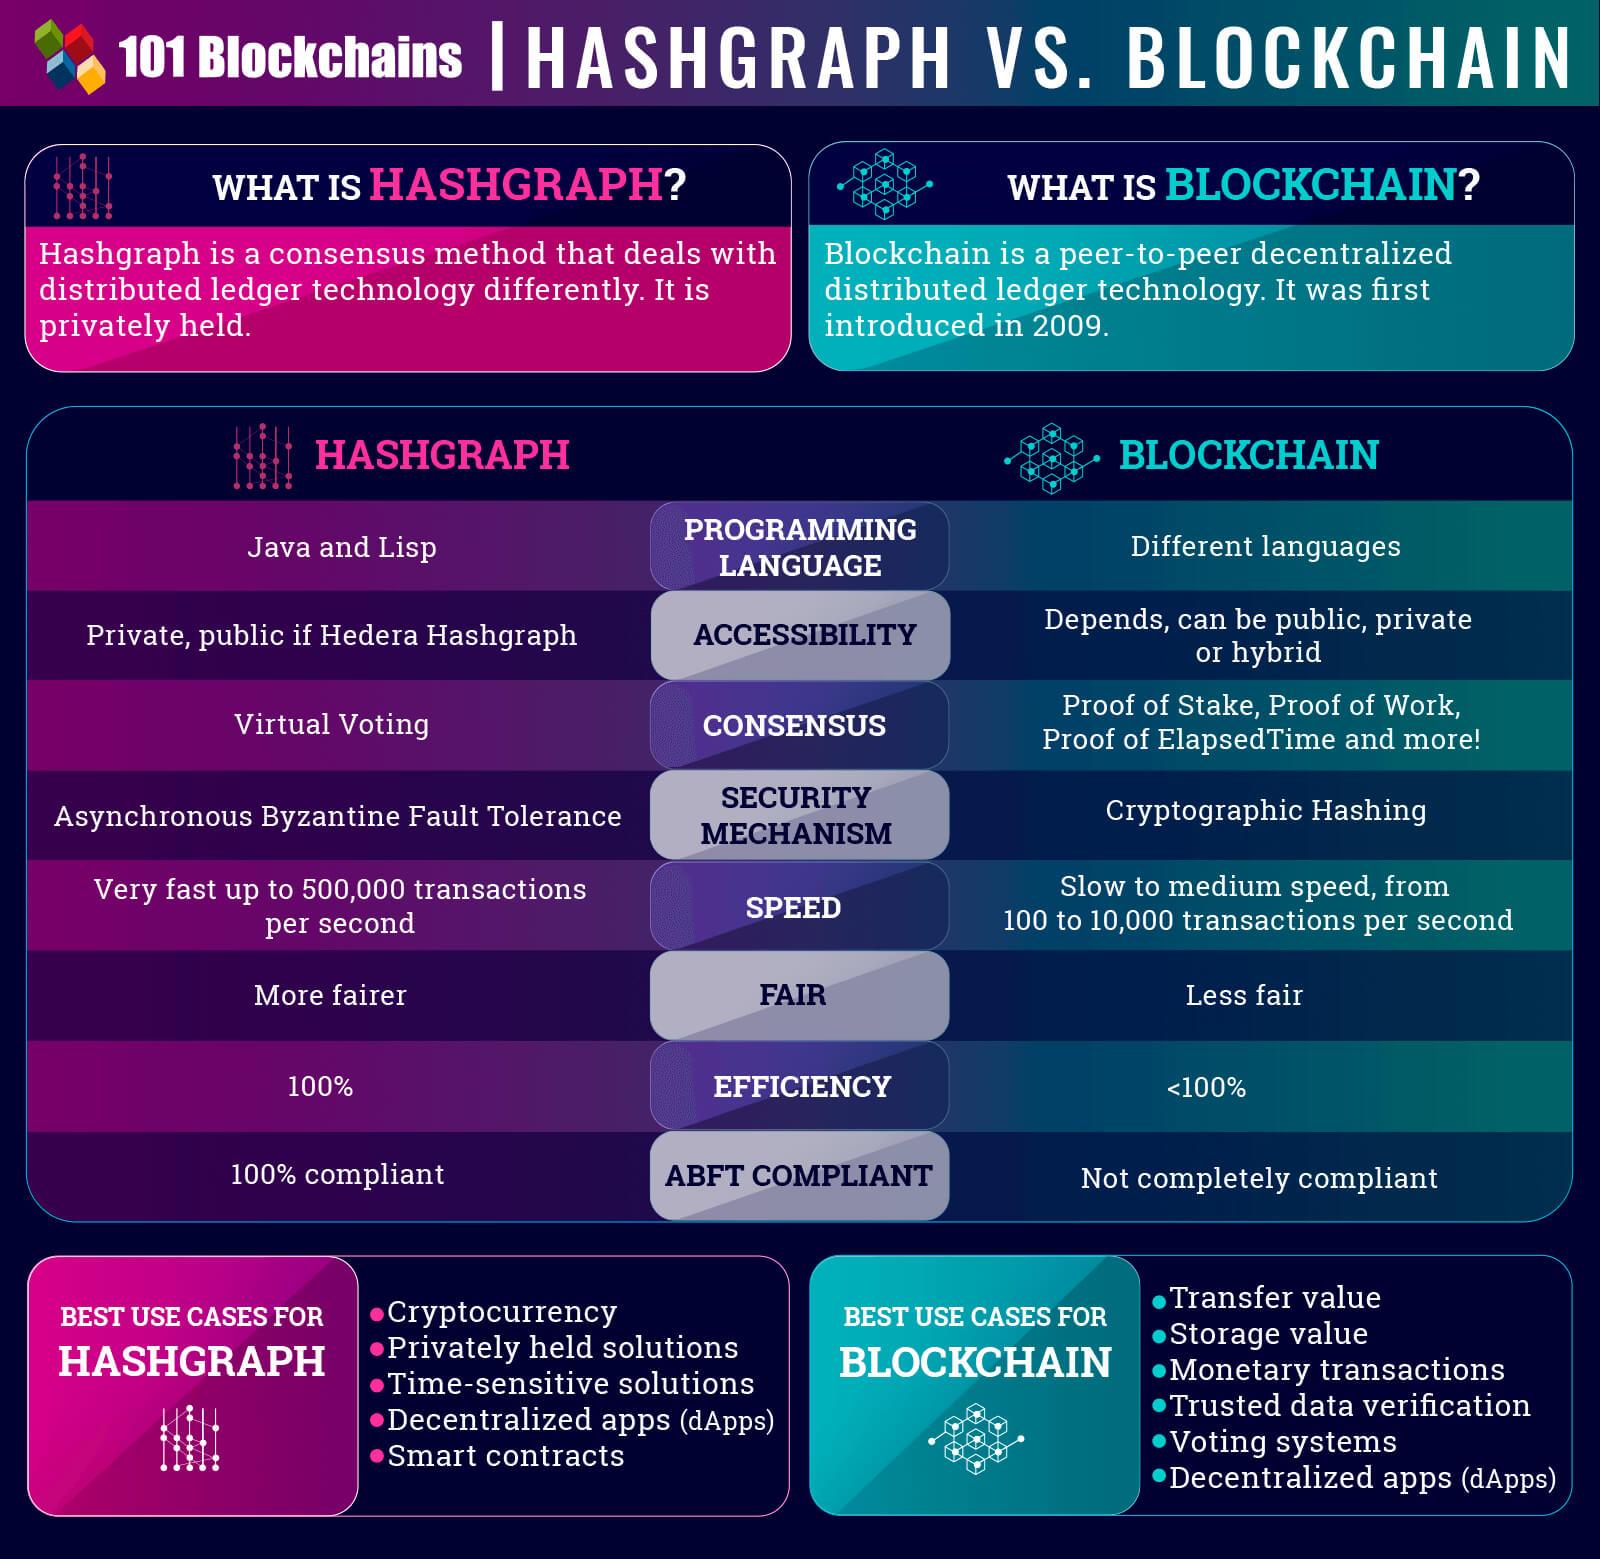 Hashgraph VS Blockchain – Pros and Cons